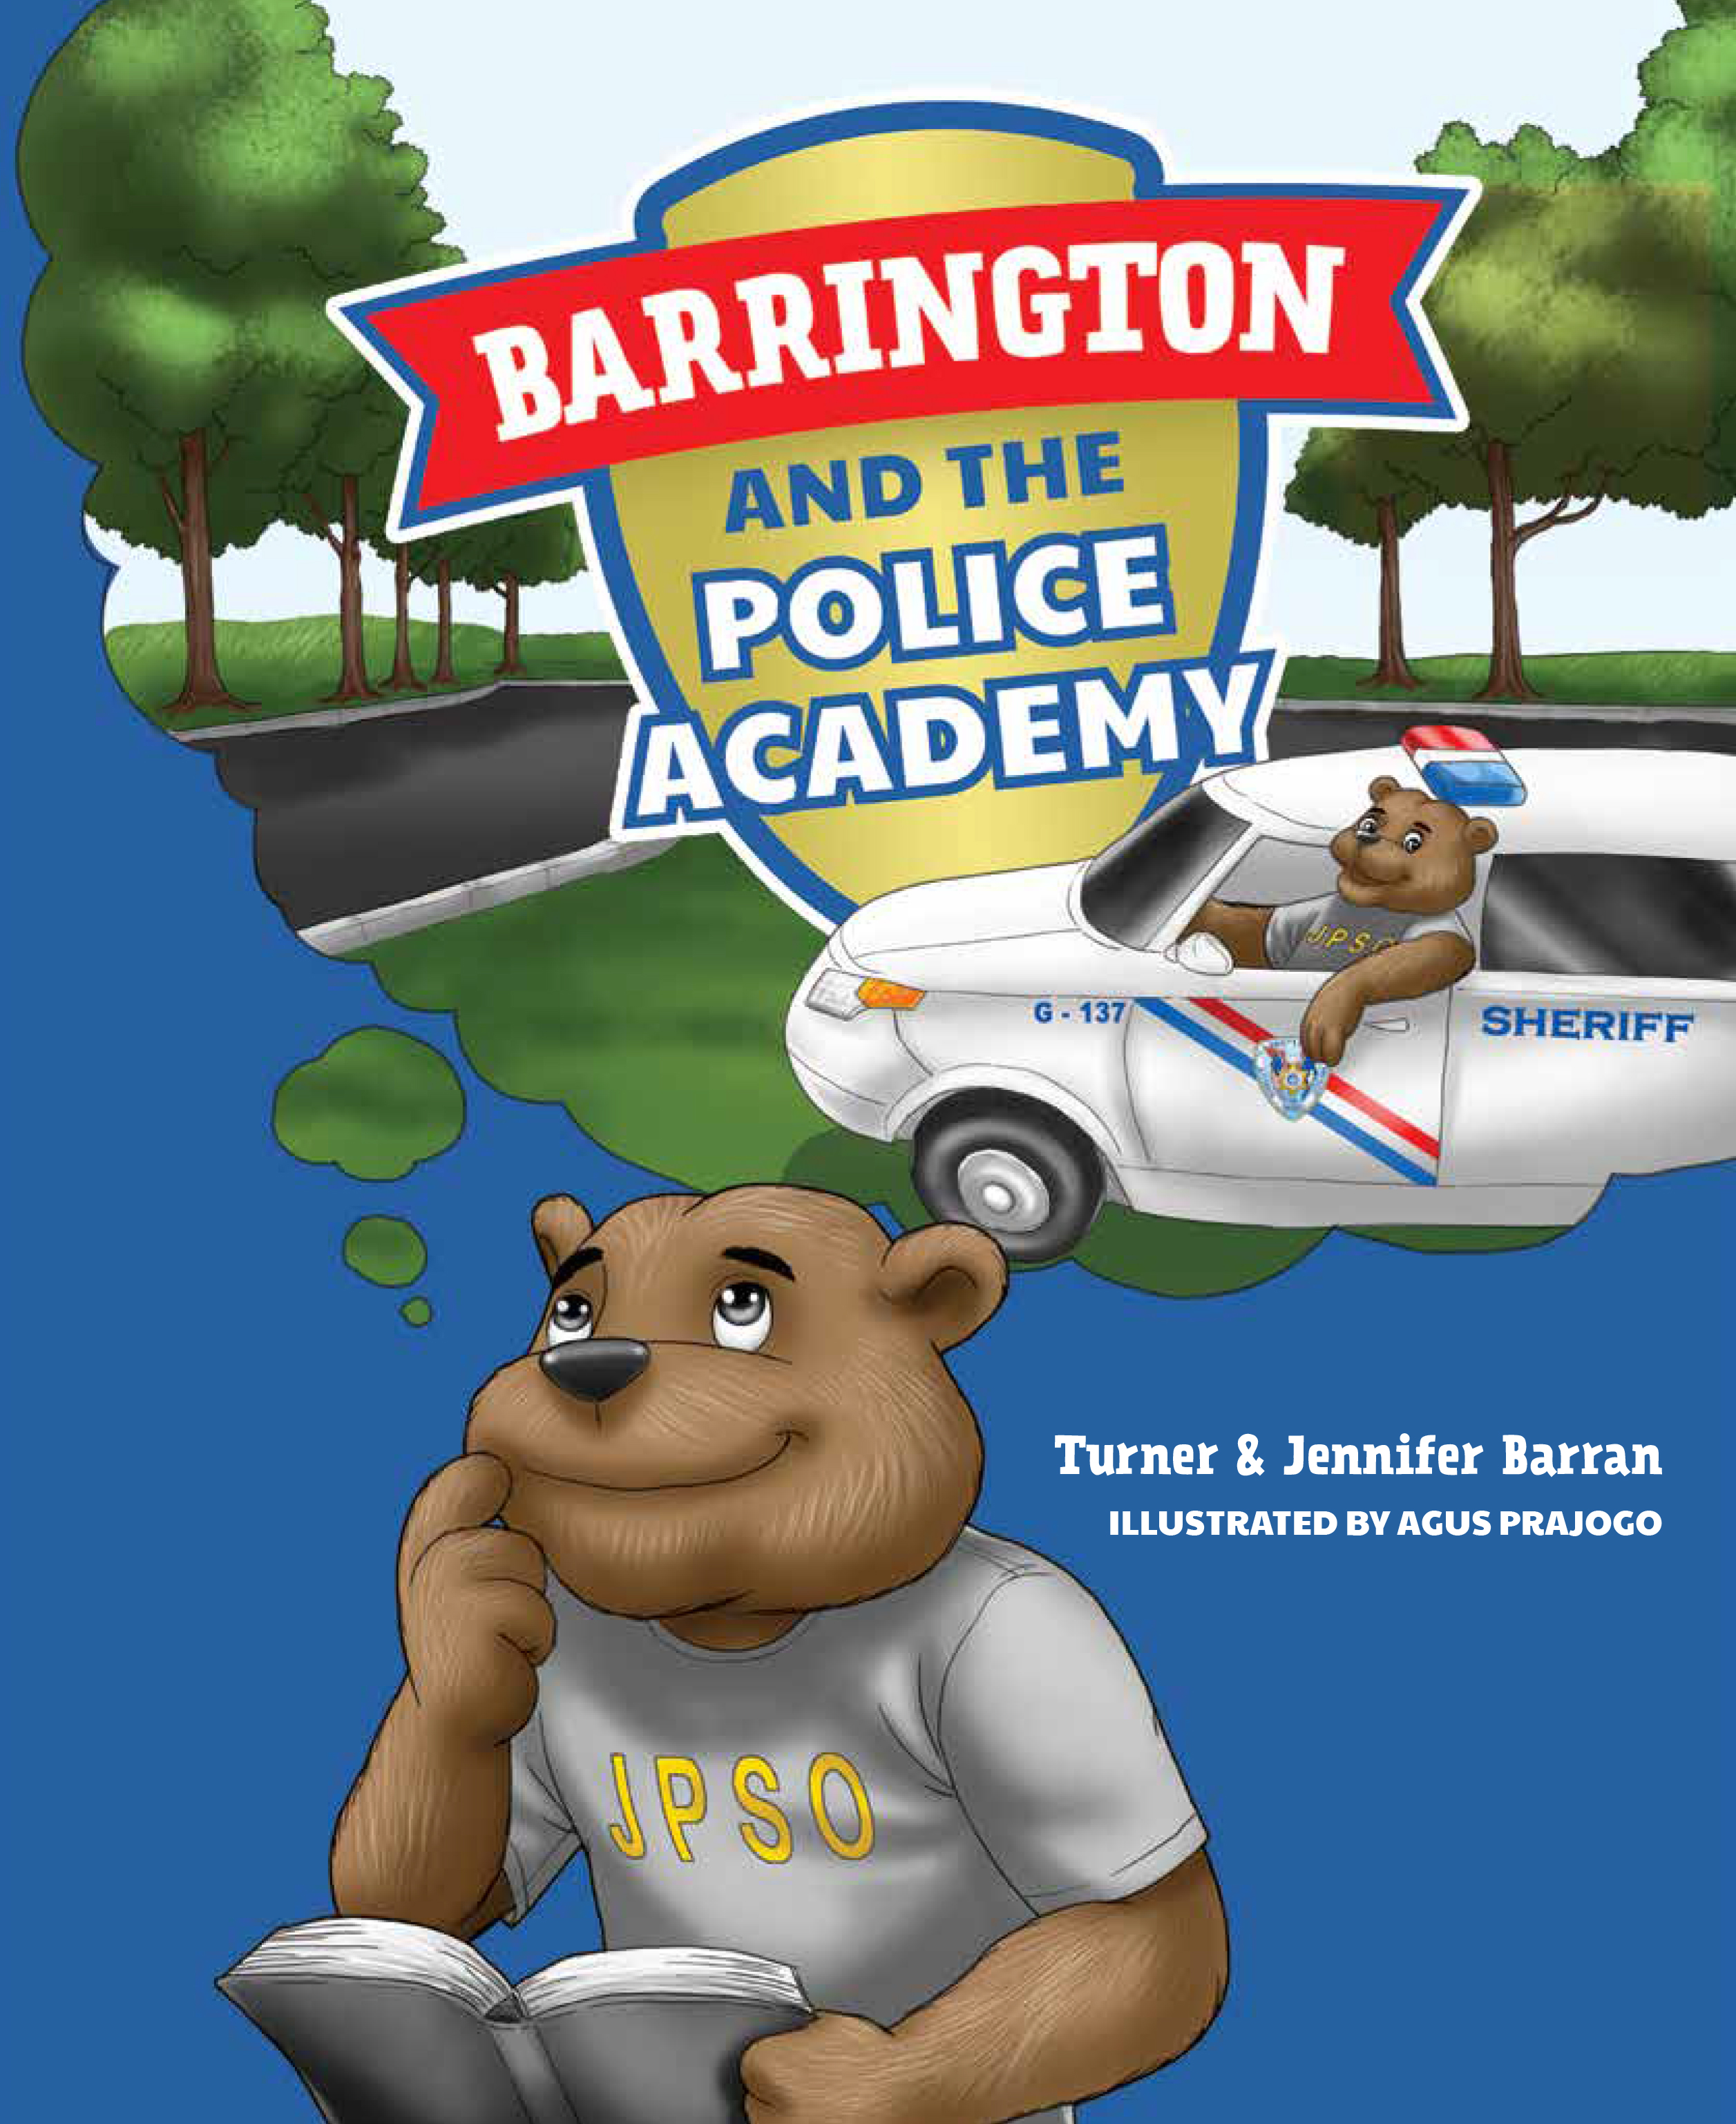 BarringtonandThePoliceAcaddemy_webcover